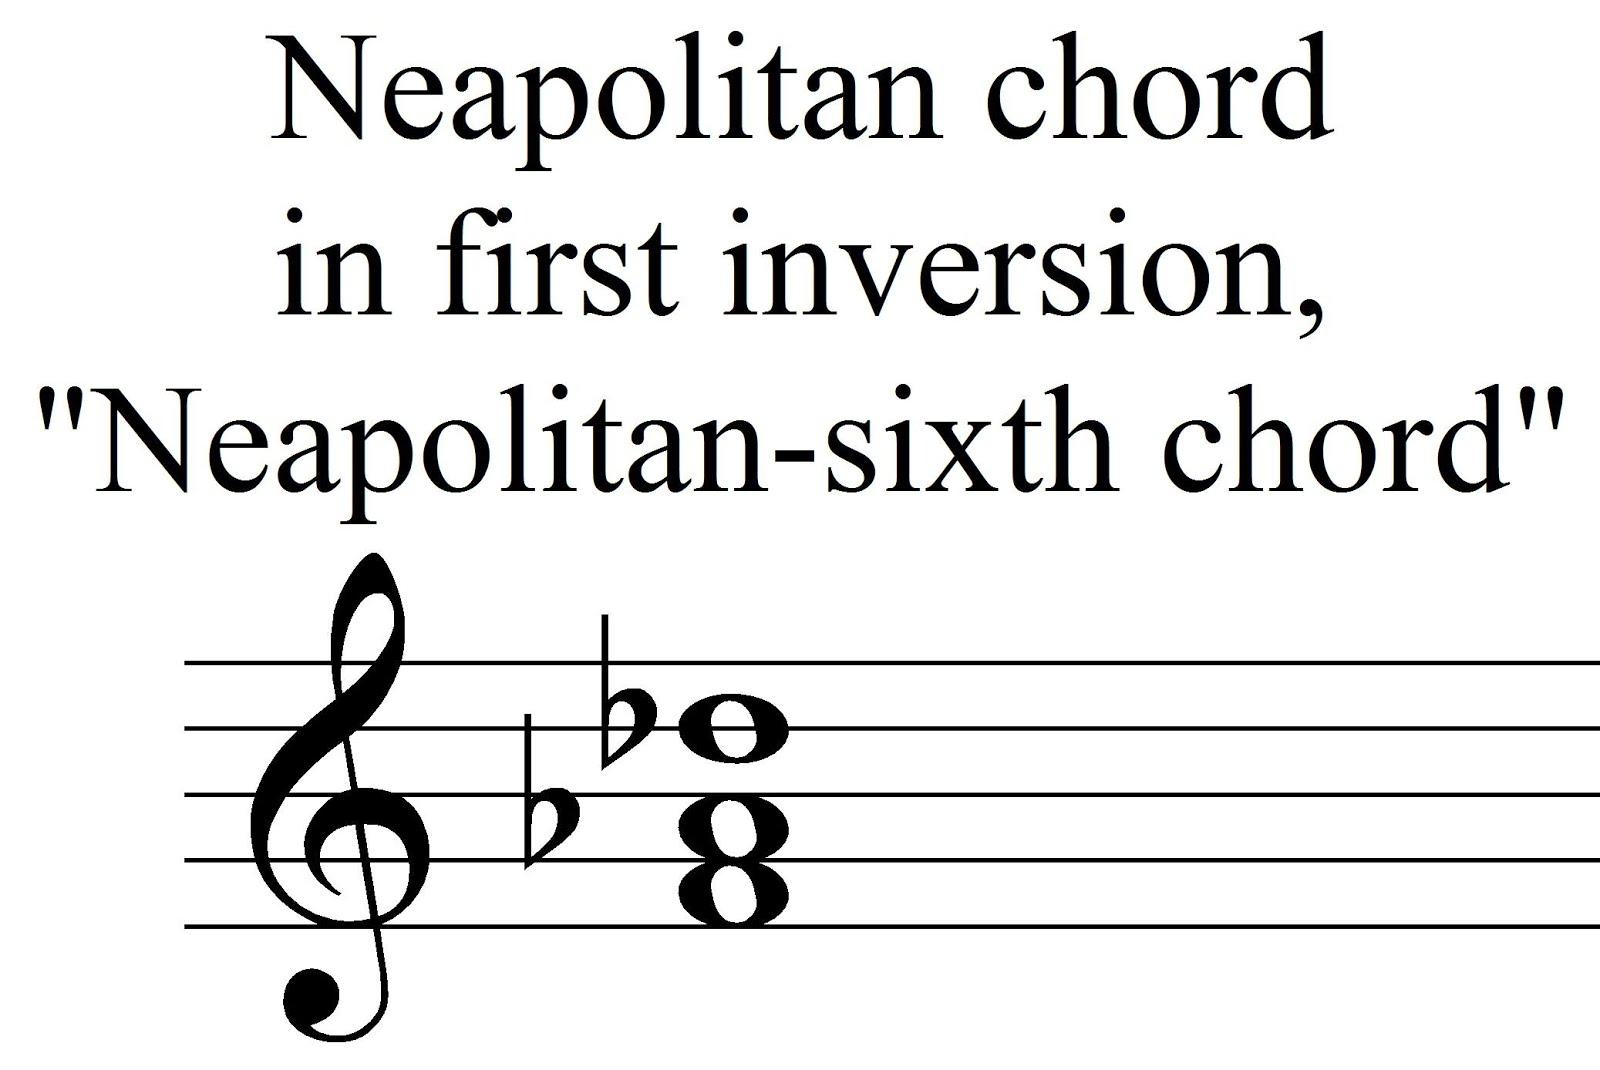 Neapolitan sixth chords